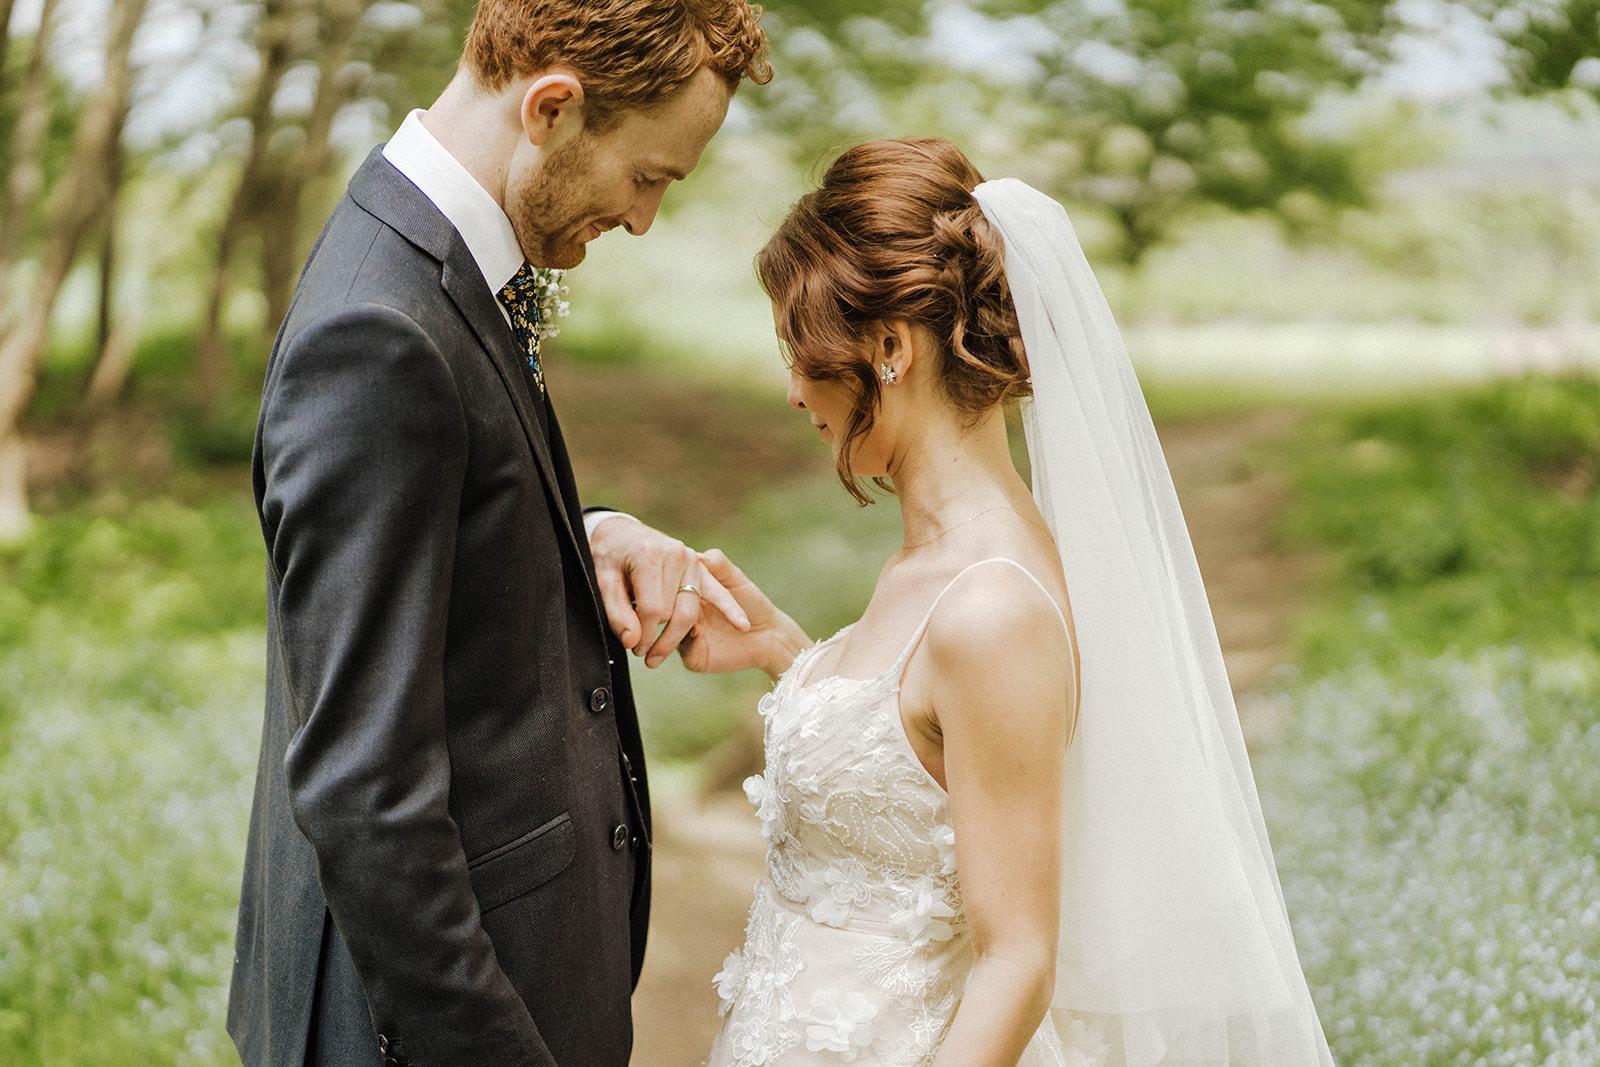 the-olde-bell-wedding-photography-jade-jonnie-319-2.jpg